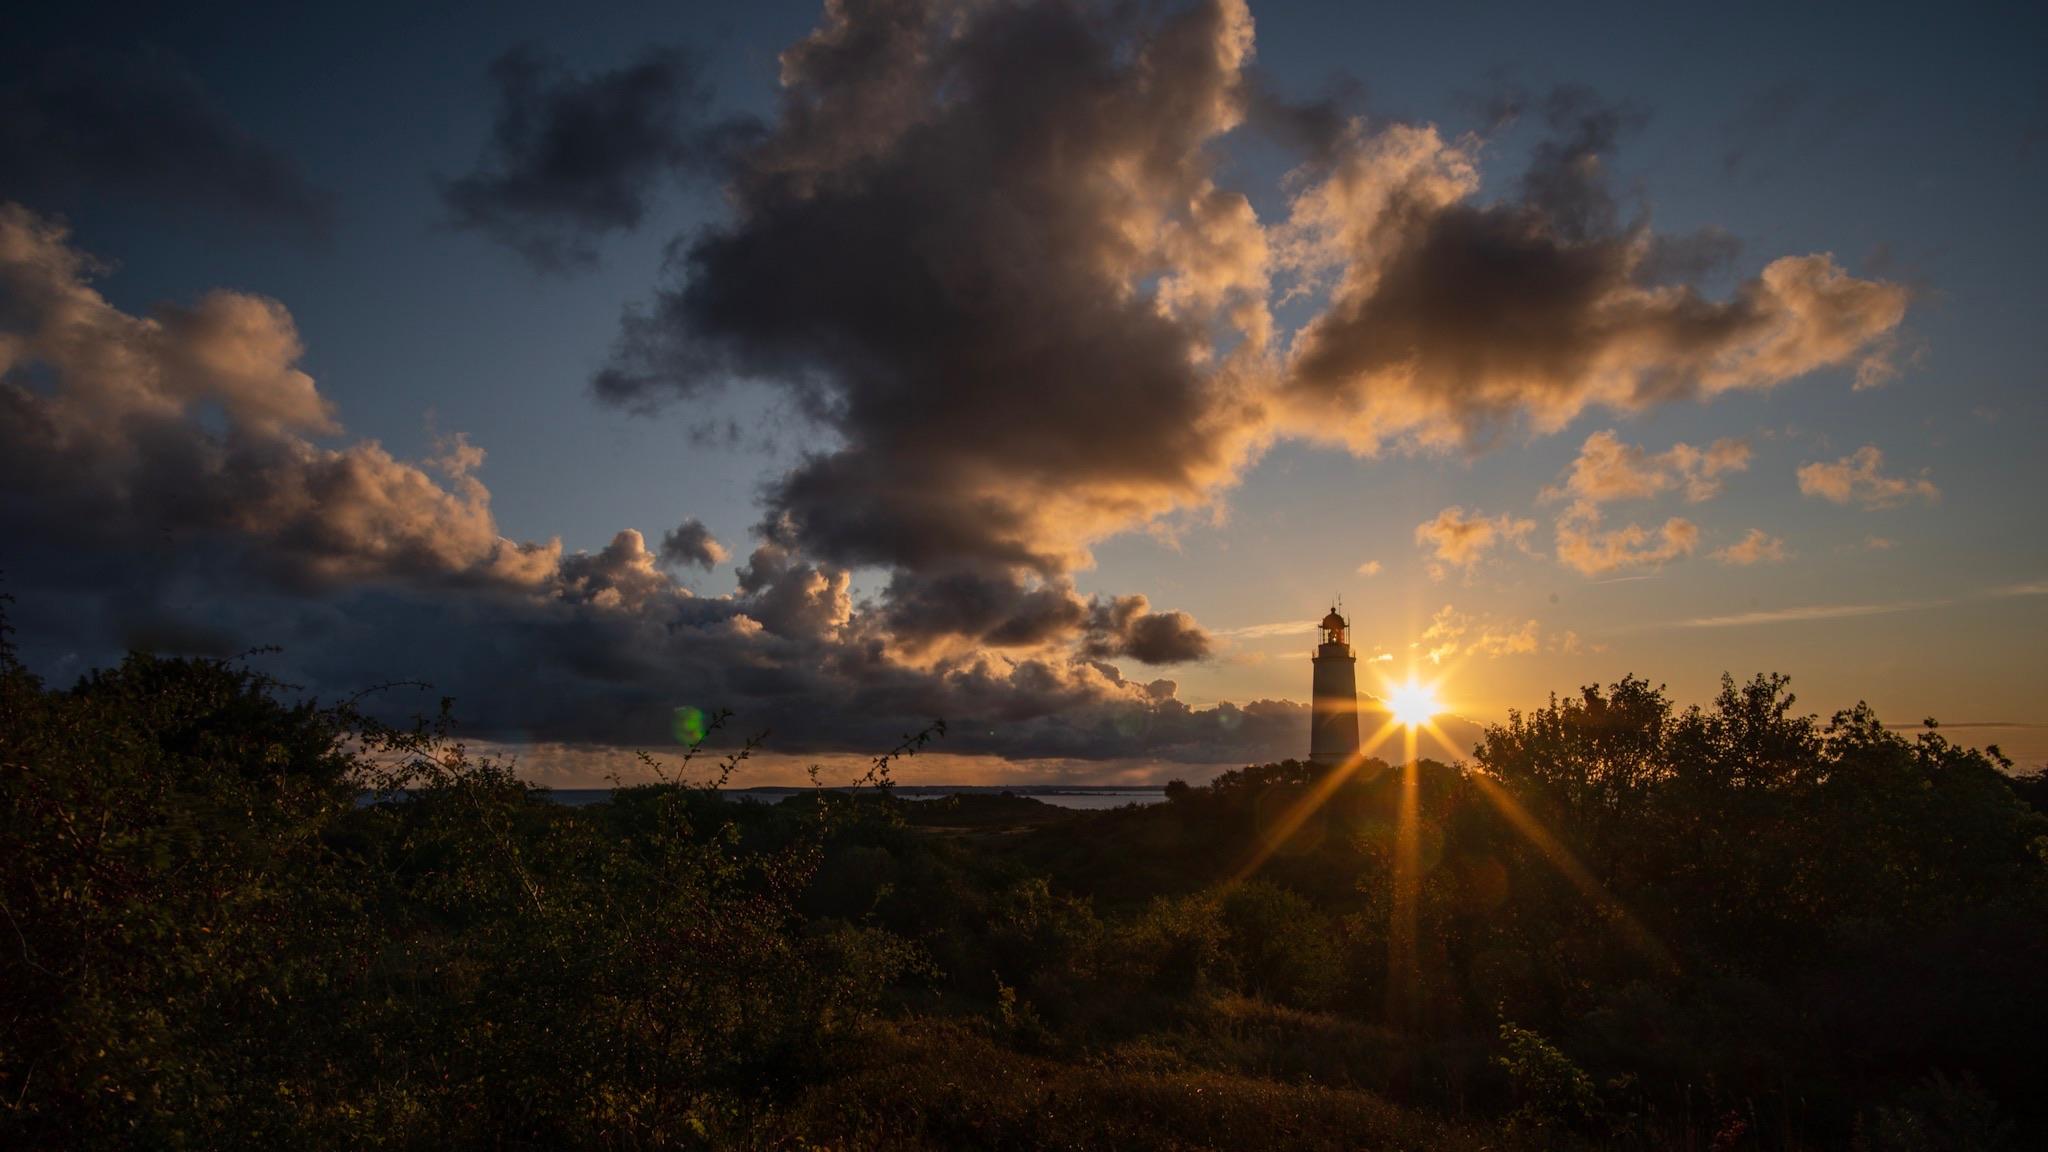 Leuchtturm Dornbusch bei Sonnenaufgang, Germany